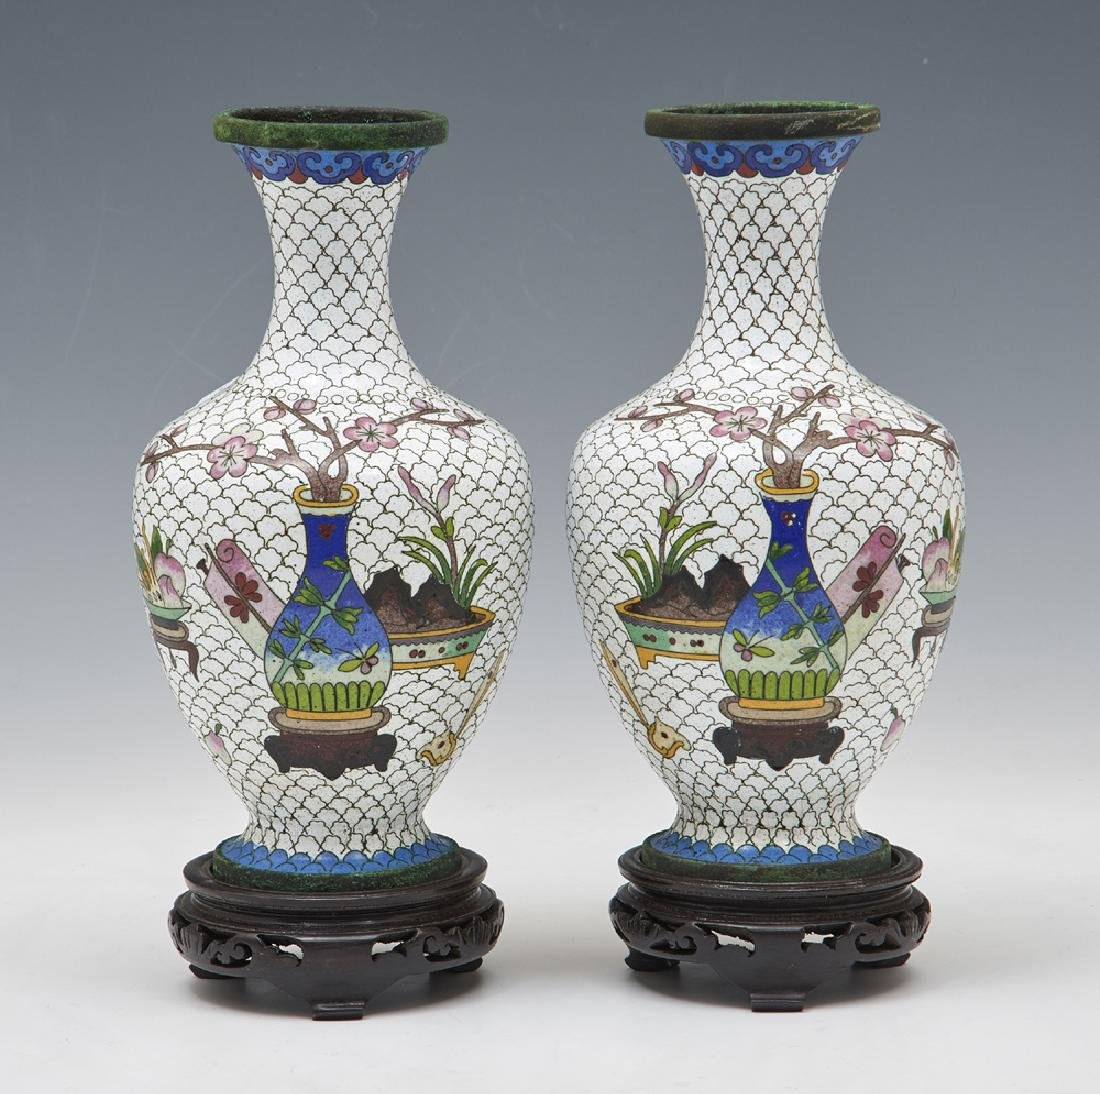 Pair of Japanese white cloisonne vases w floral decor